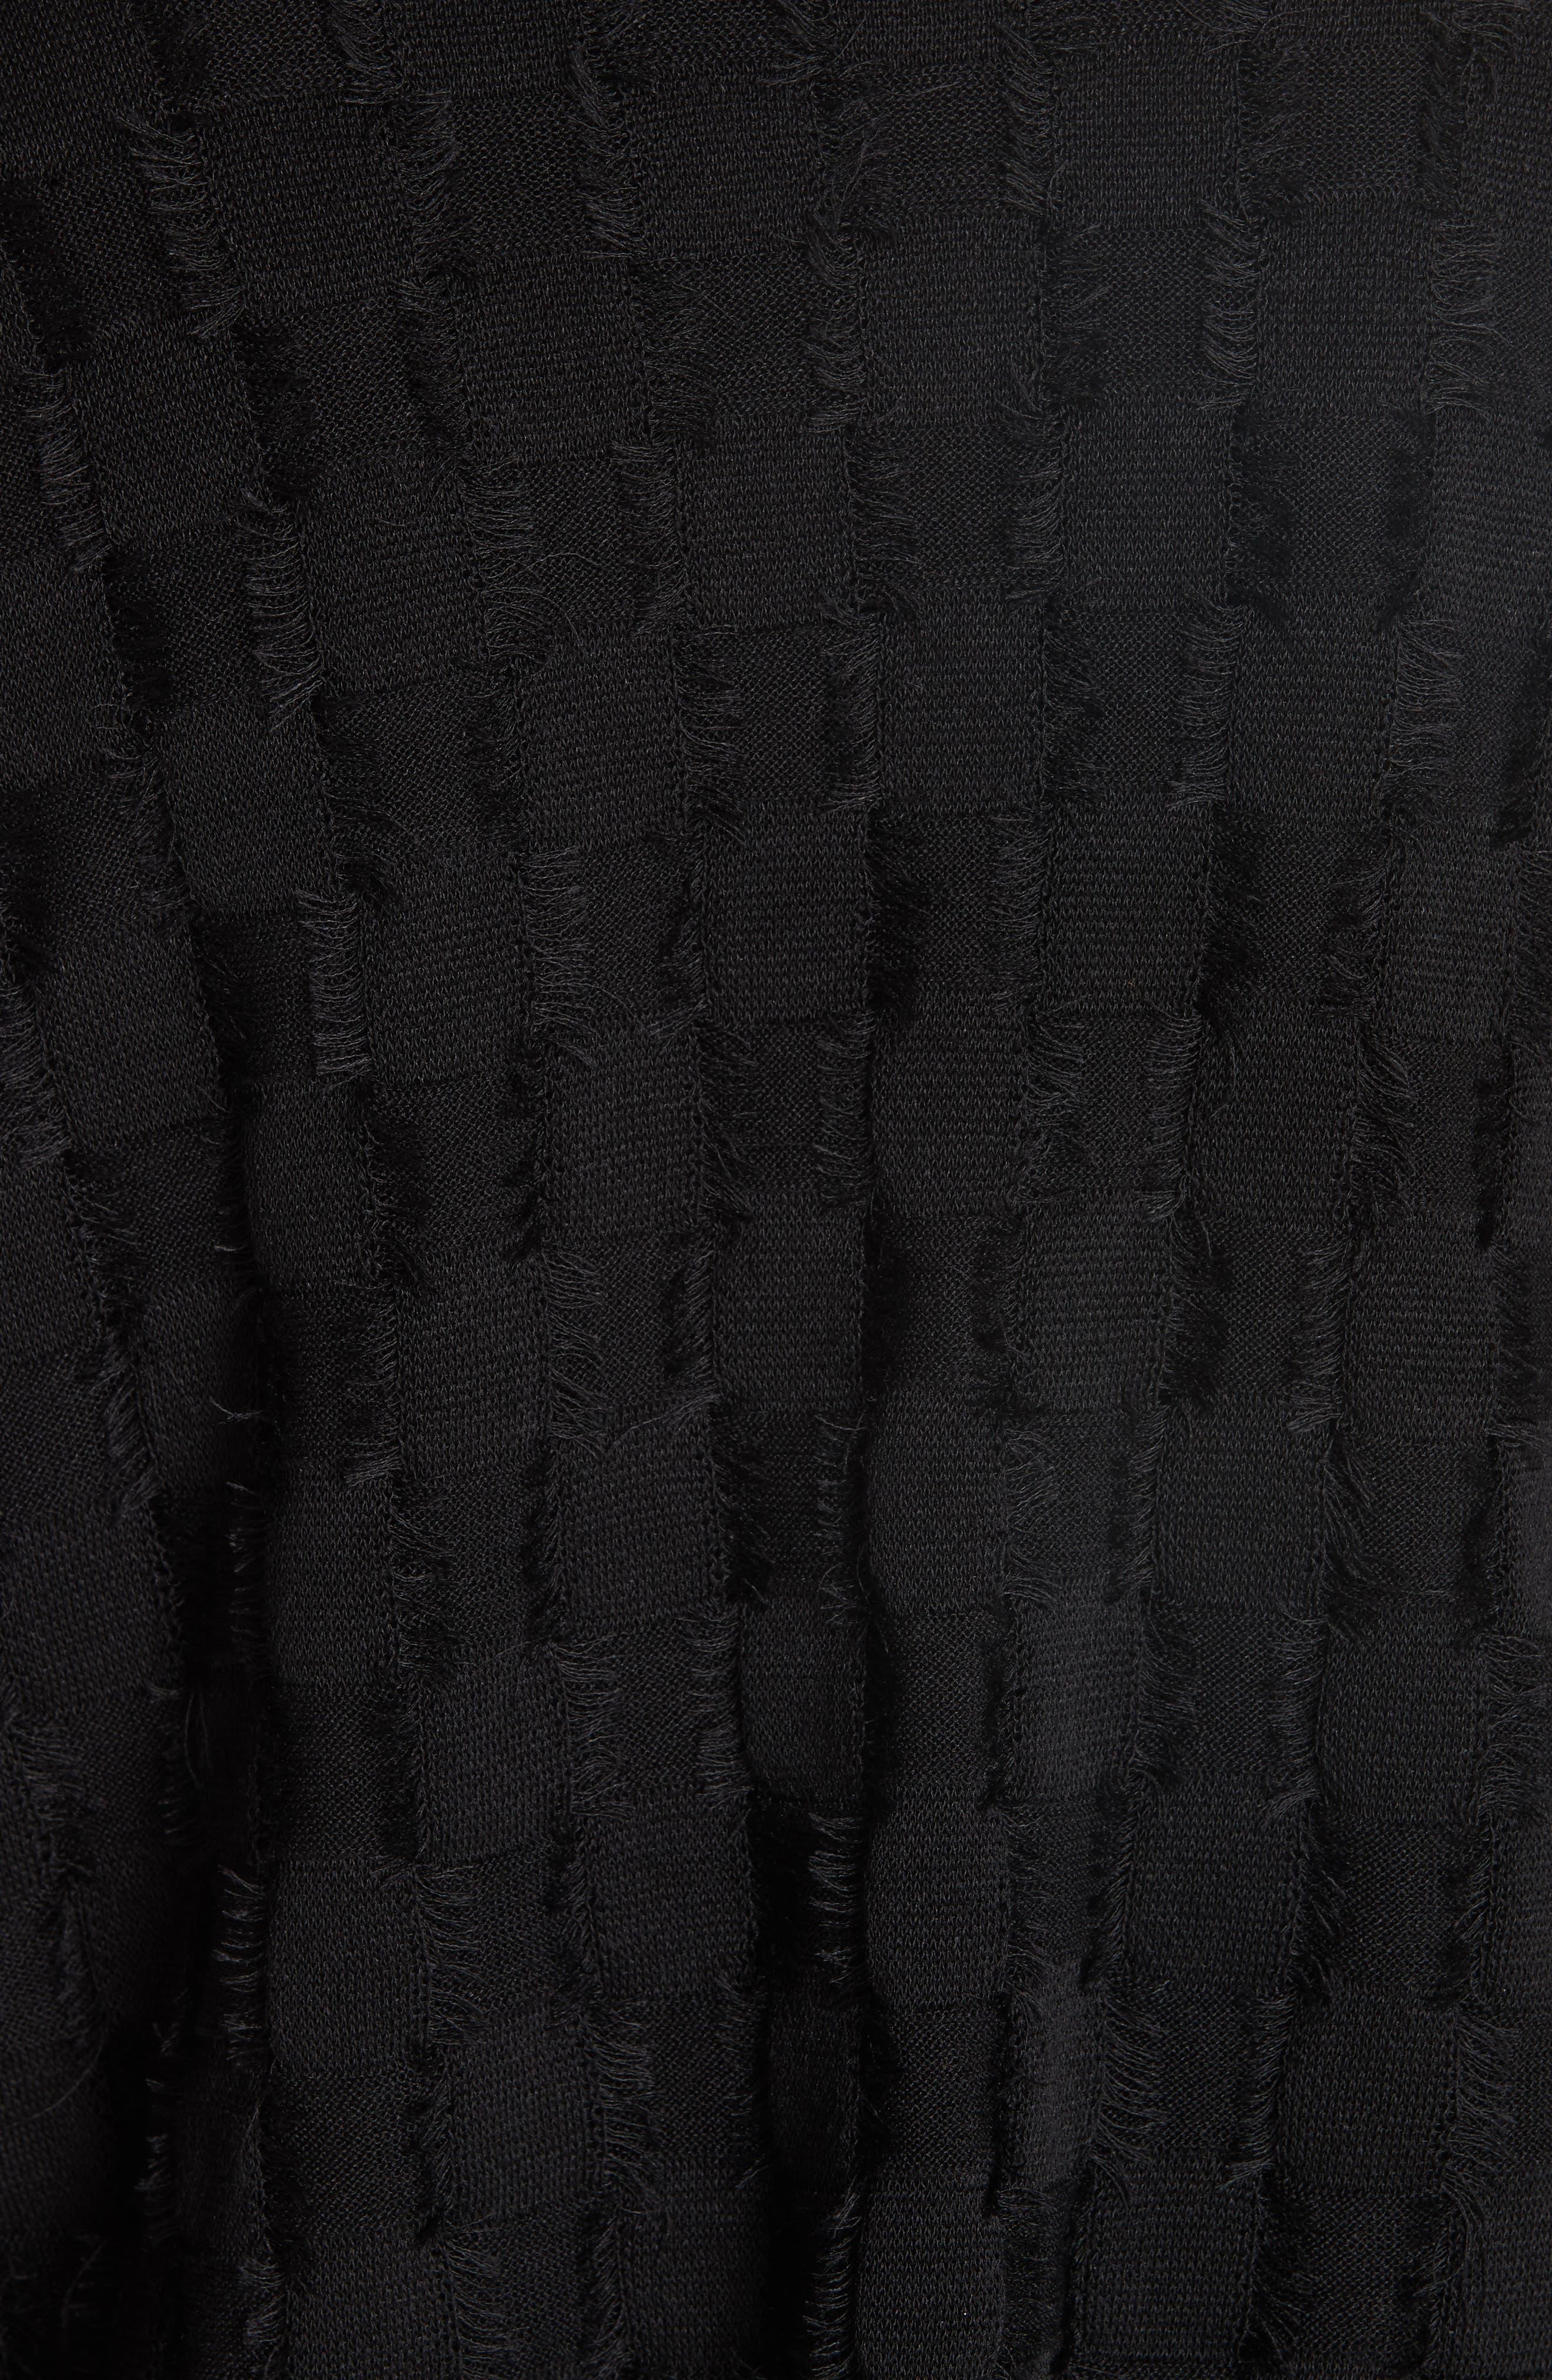 Fringe Knit Sweater,                             Alternate thumbnail 3, color,                             Black